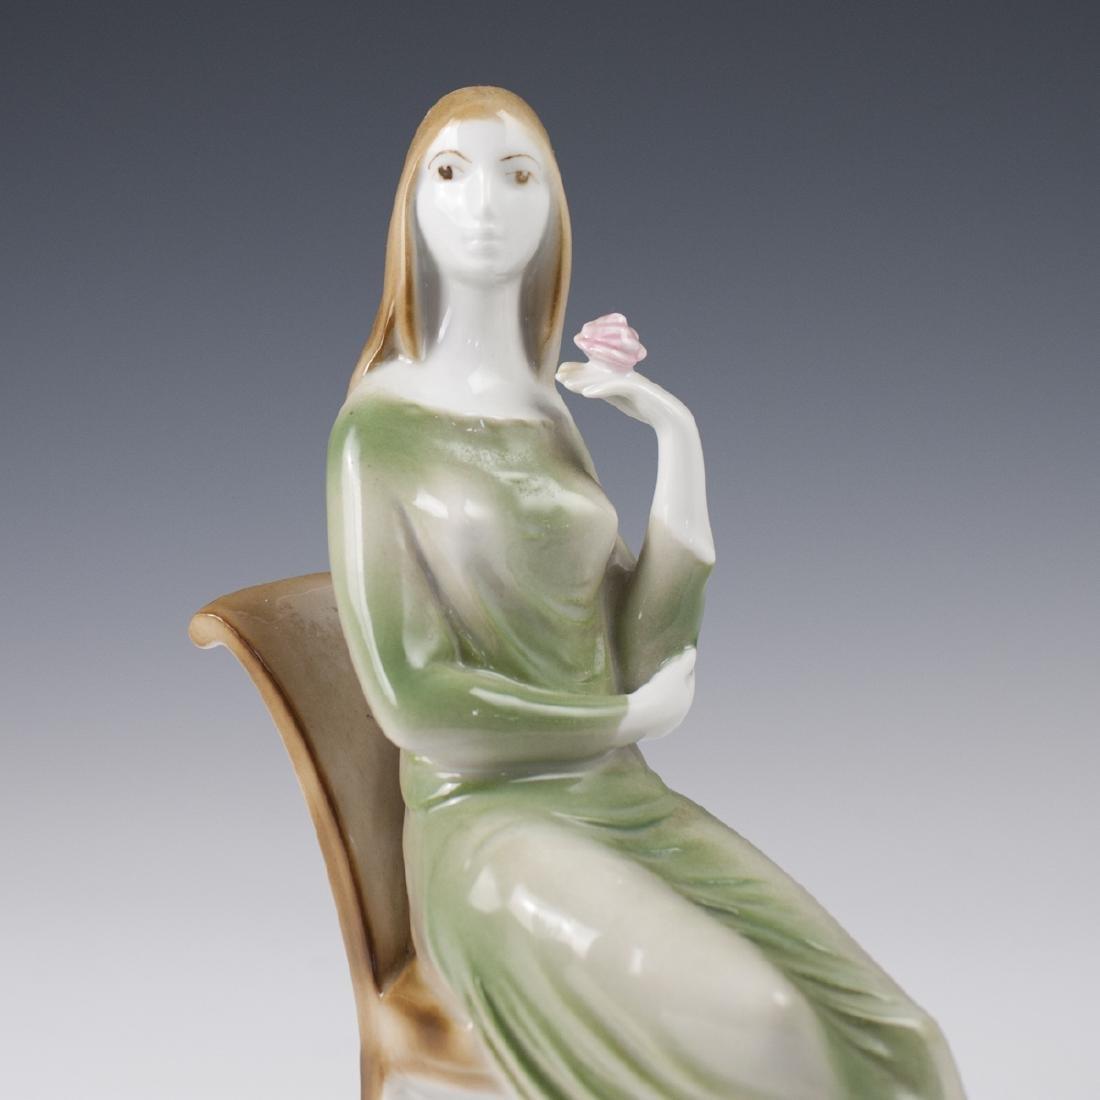 Zsolnay Porcelain Figurine - 2